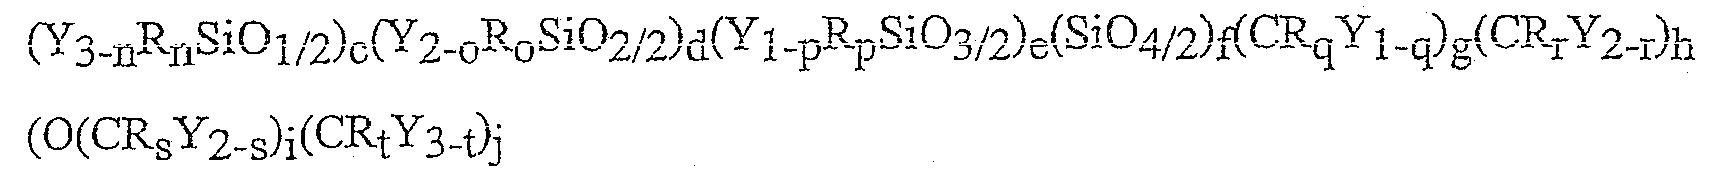 Figure 112006001728637-pct00007